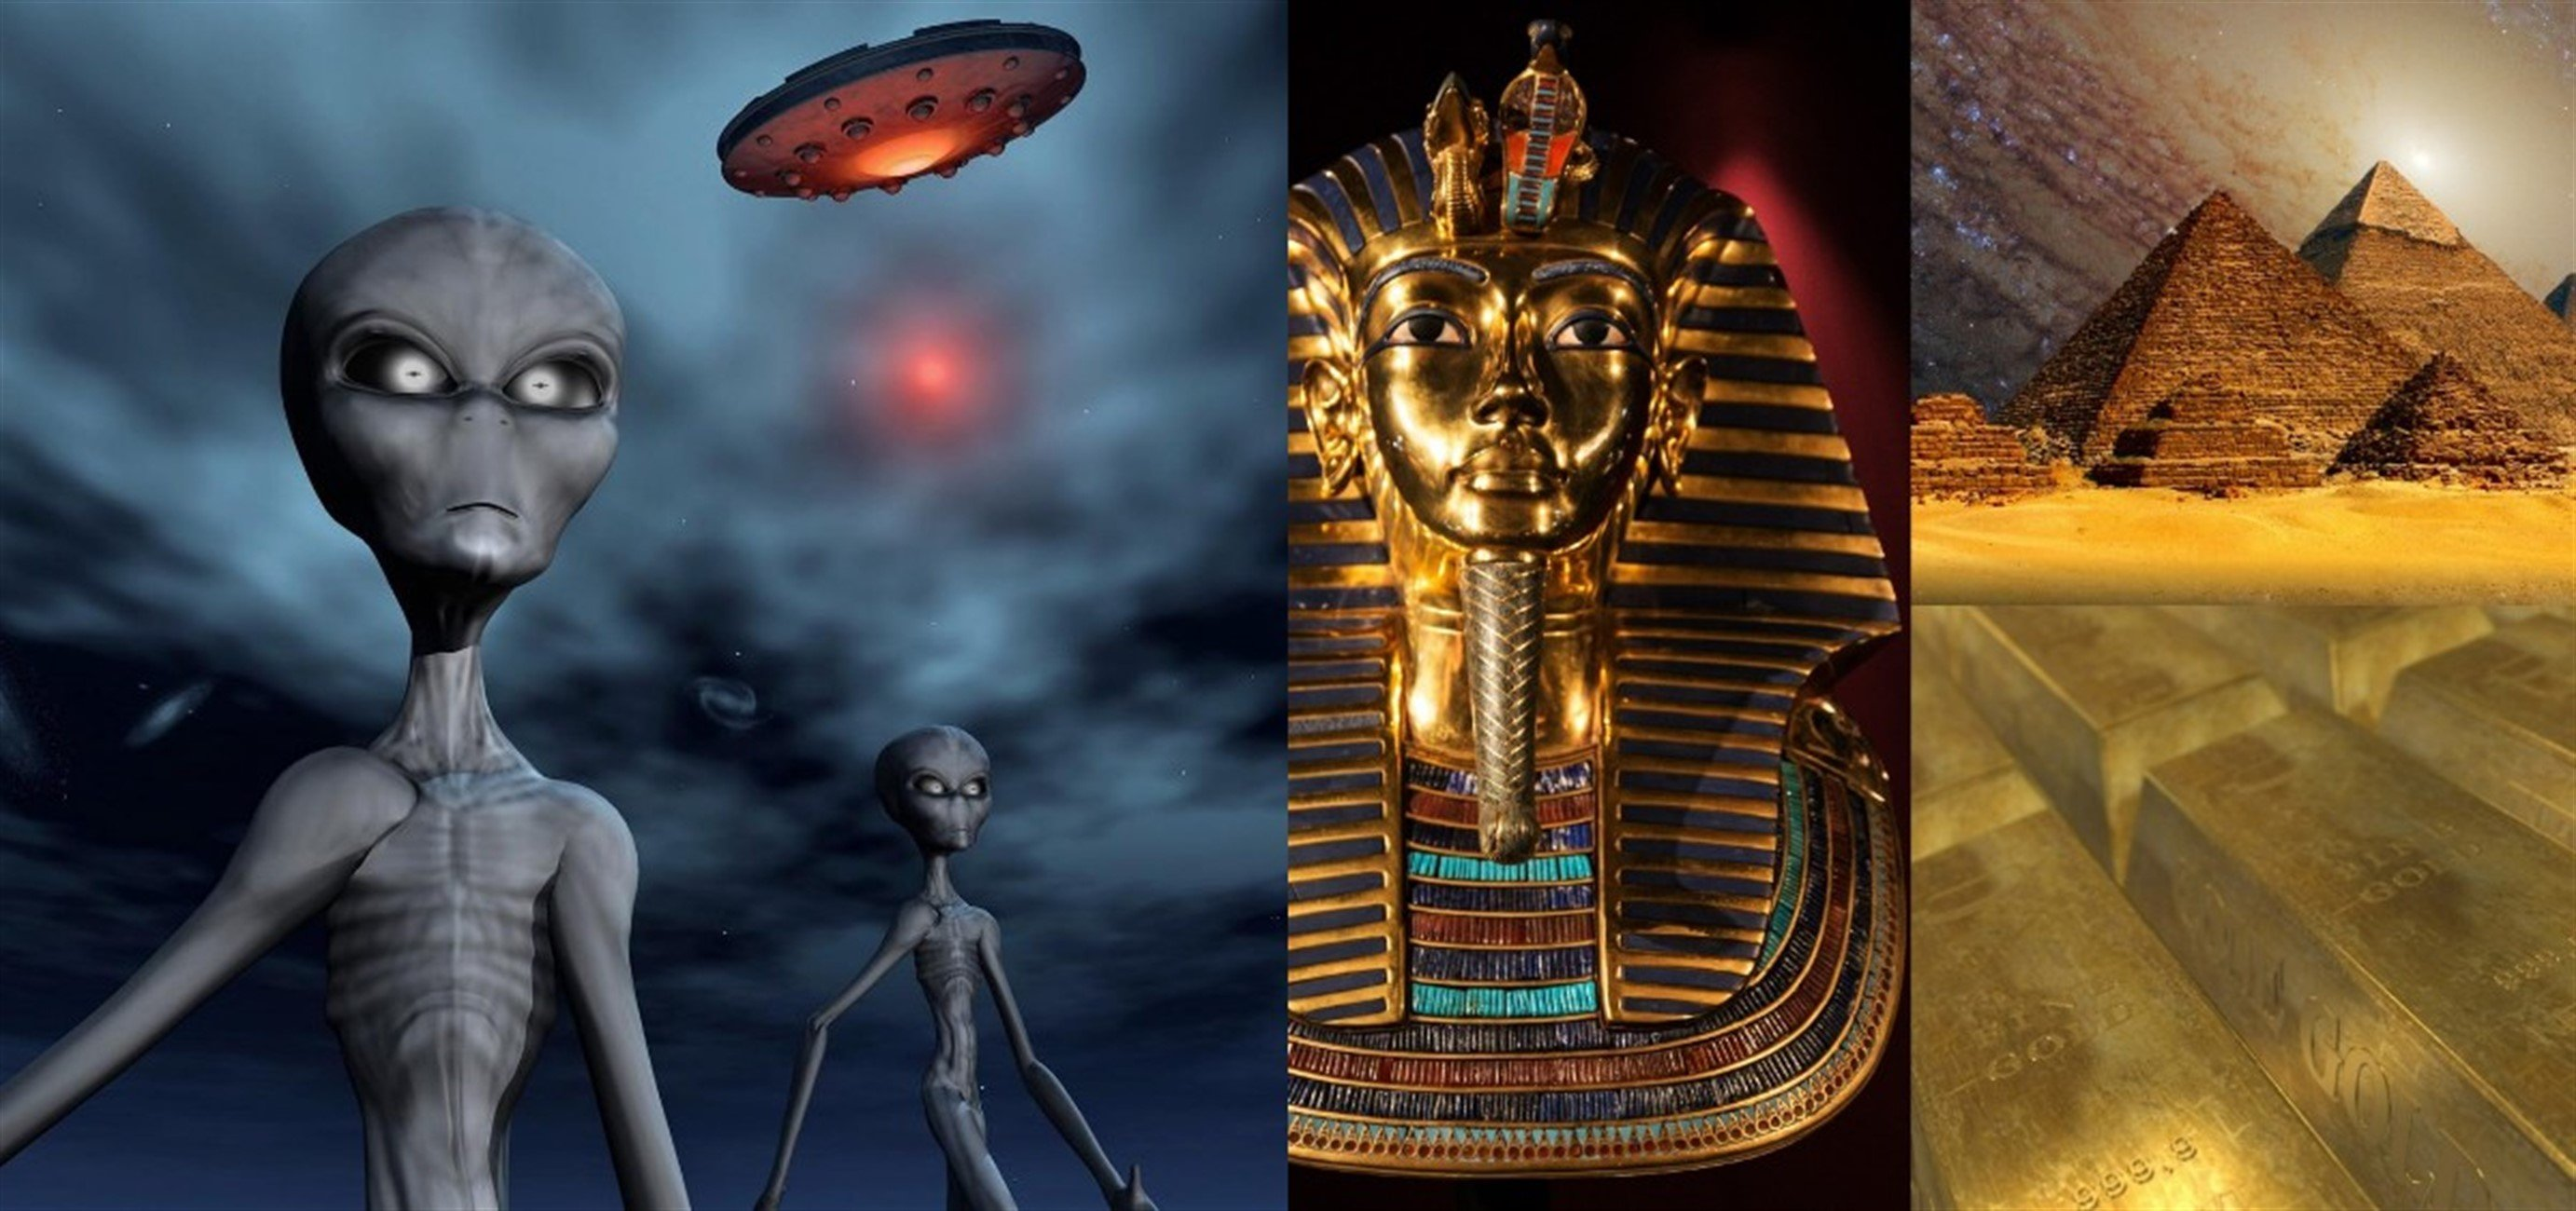 Нибиру, рептилоид, пирамида, портал, аномалия, происшествия, феномен